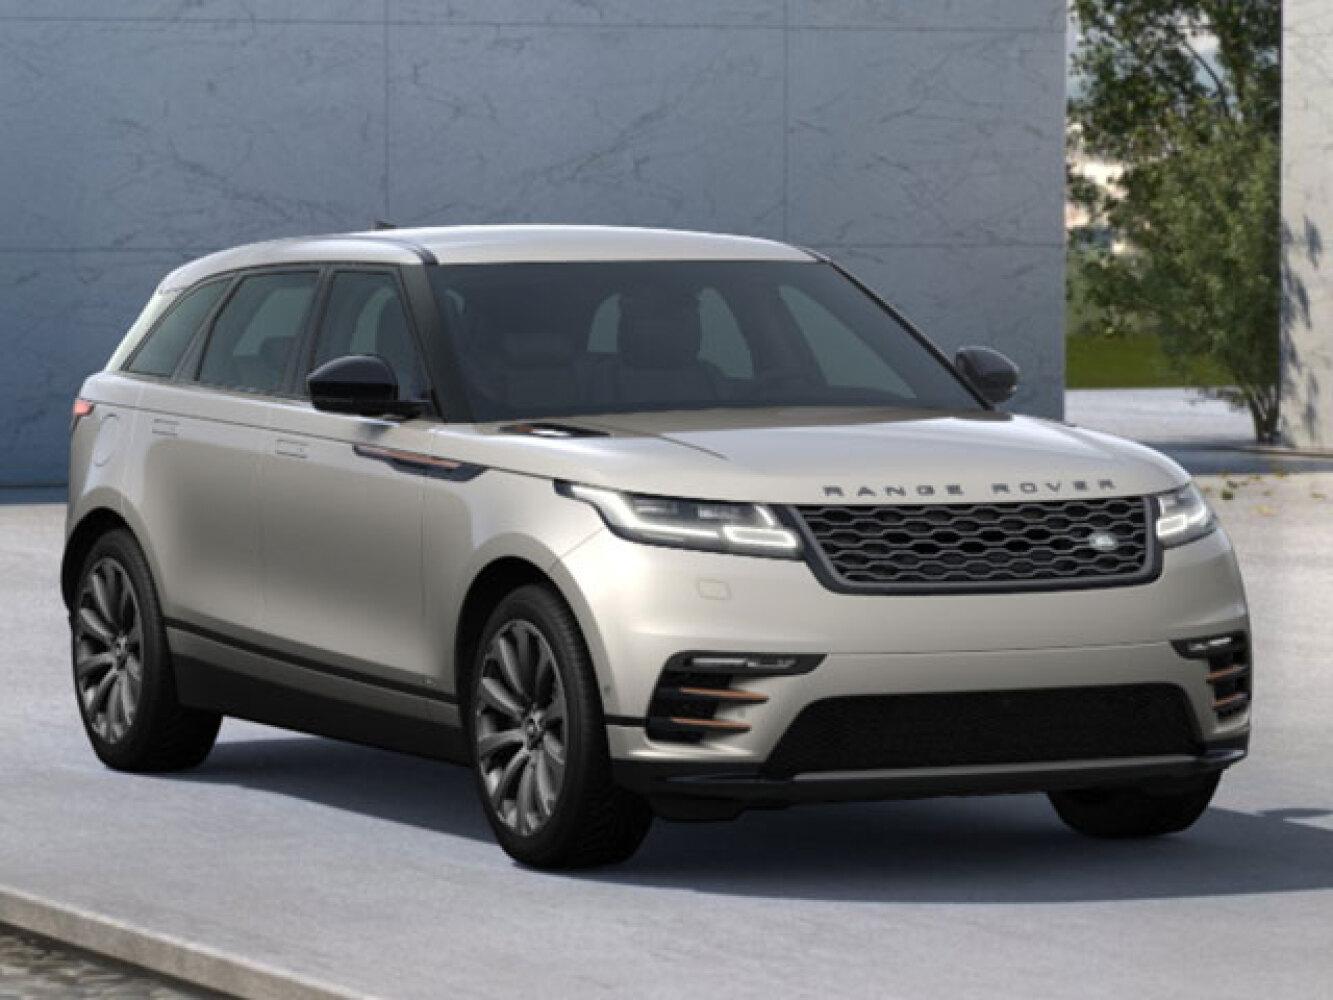 New Land Rover Range Rover Velar 2 0 D240 R Dynamic Hse